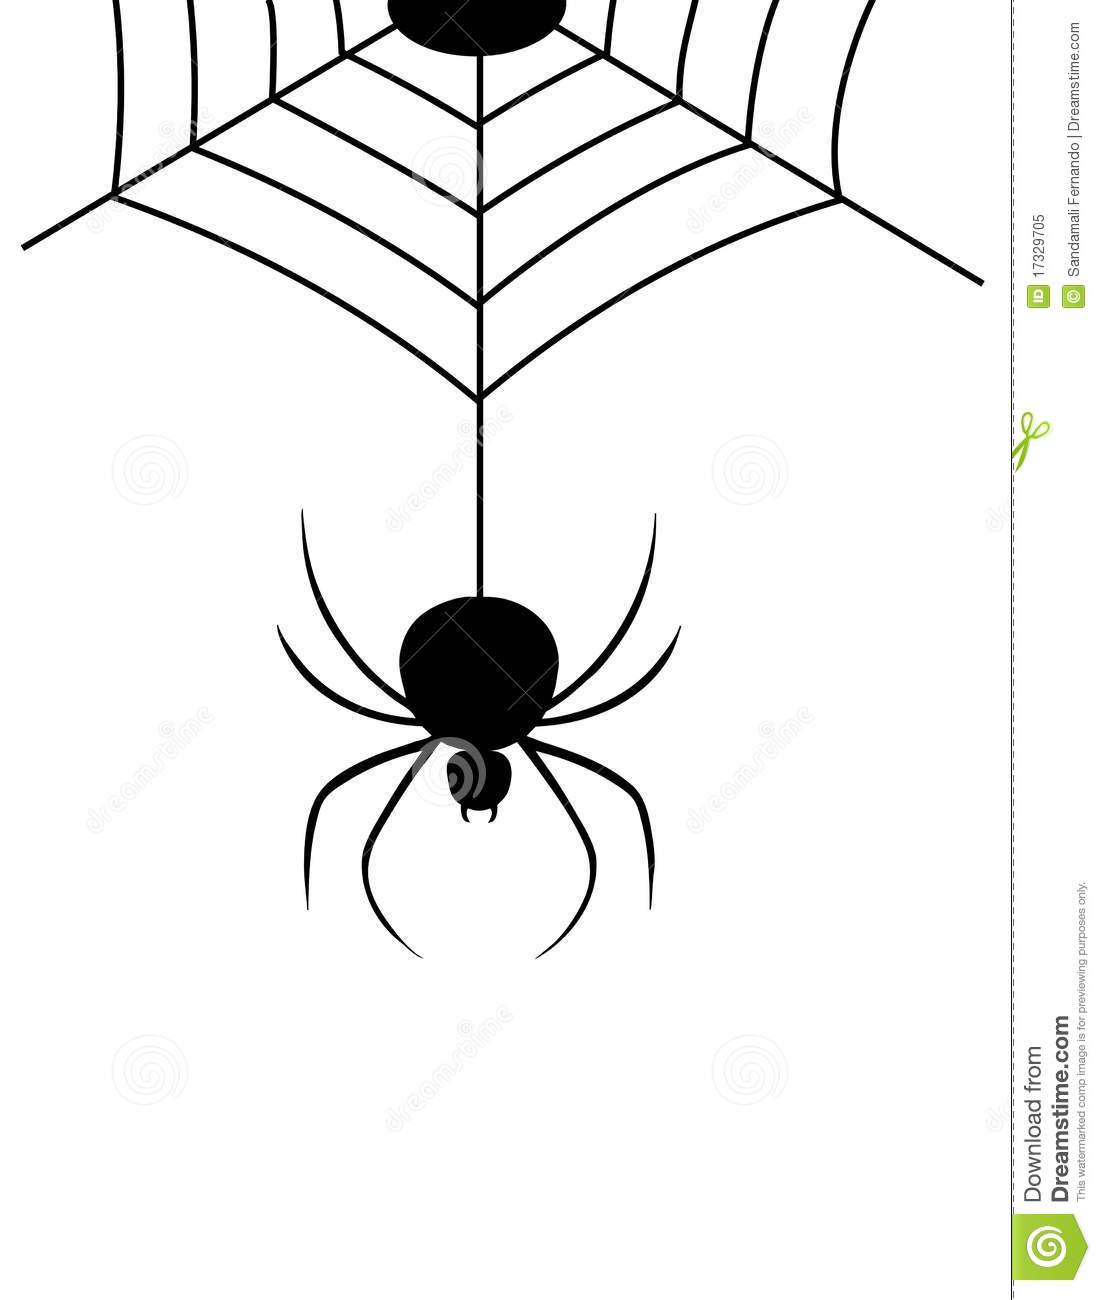 1101x1300 Drawn Spider Web Hanging